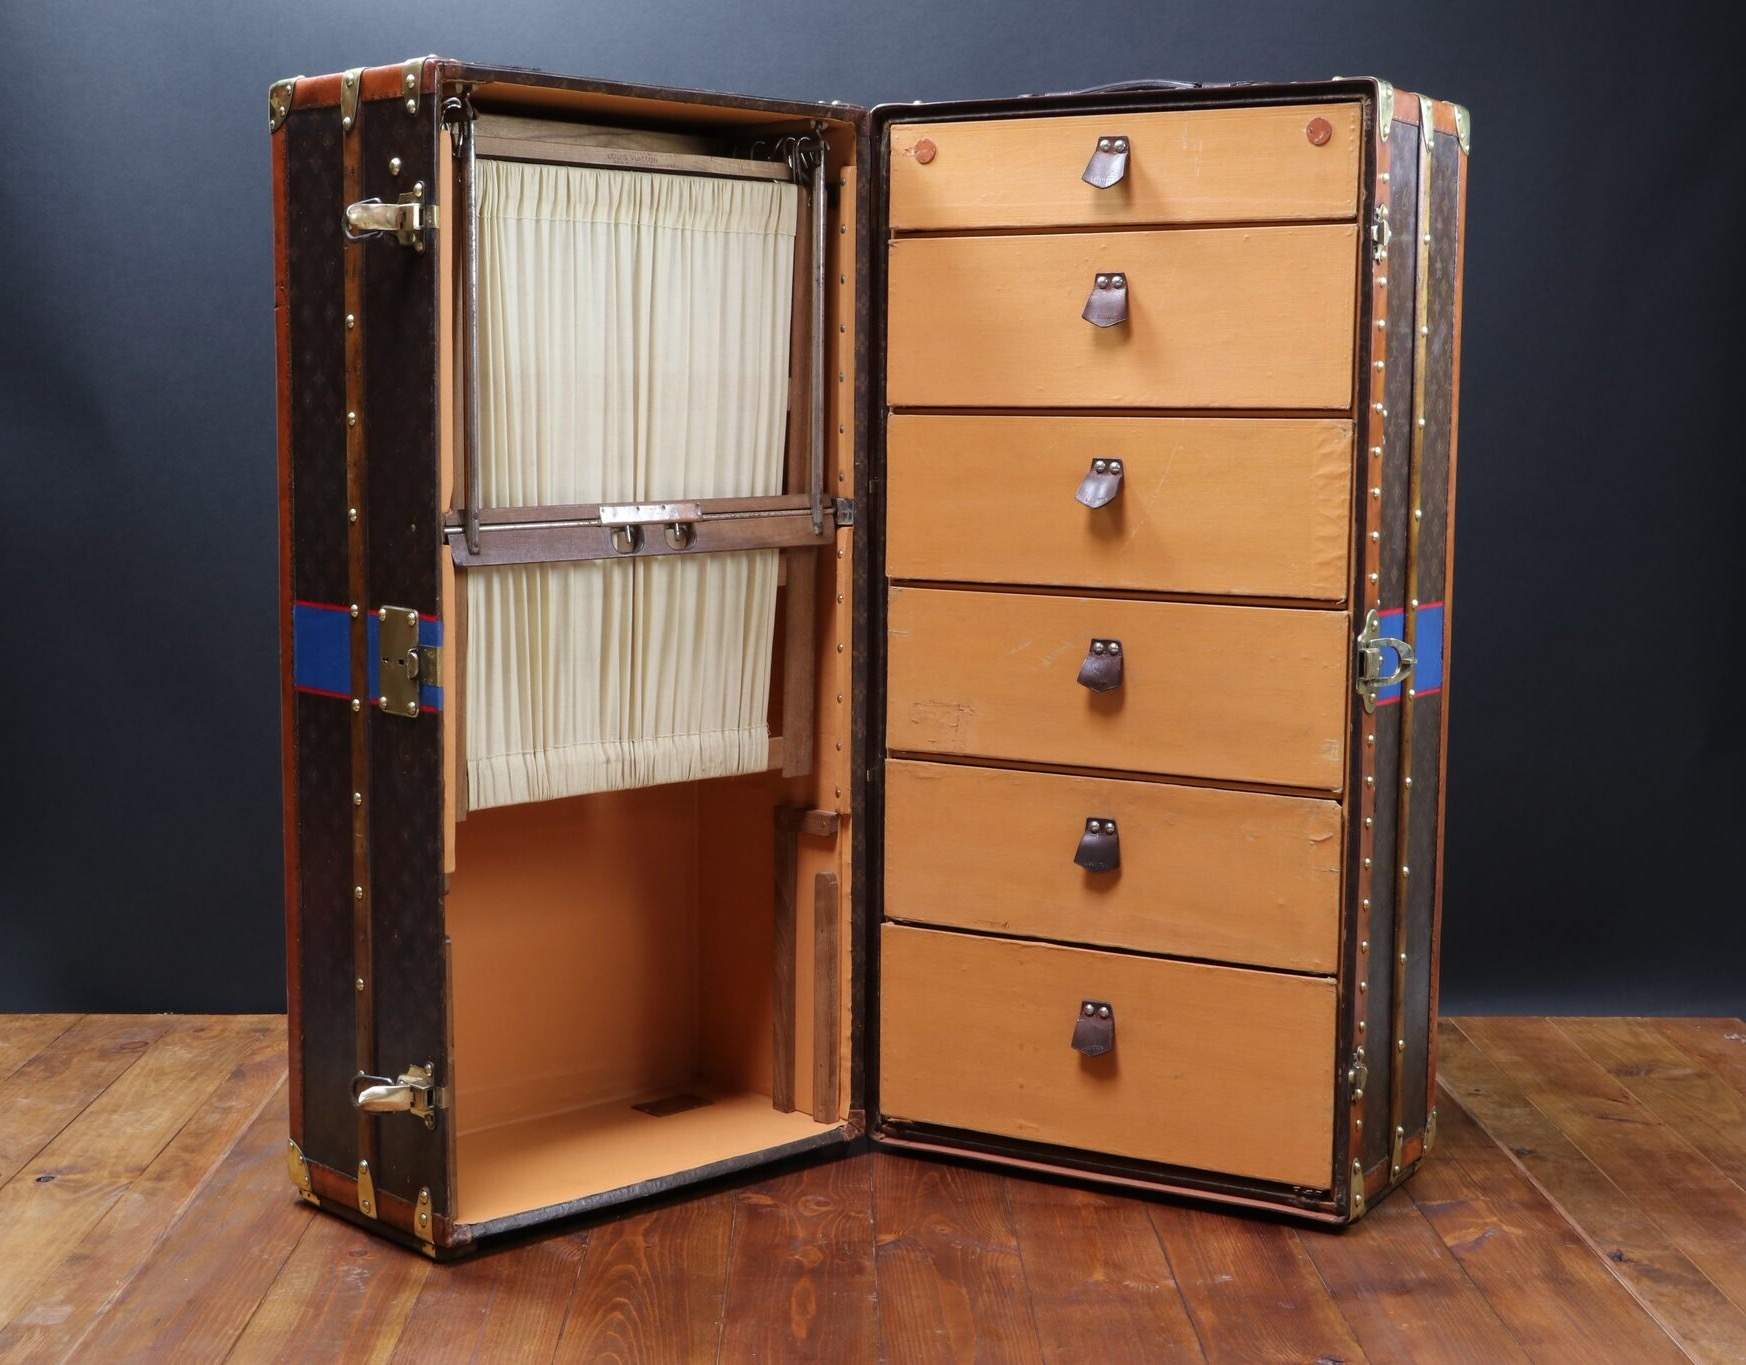 Mame Fashion Dictionary: Louis Vuitton Wardrobe Trunk